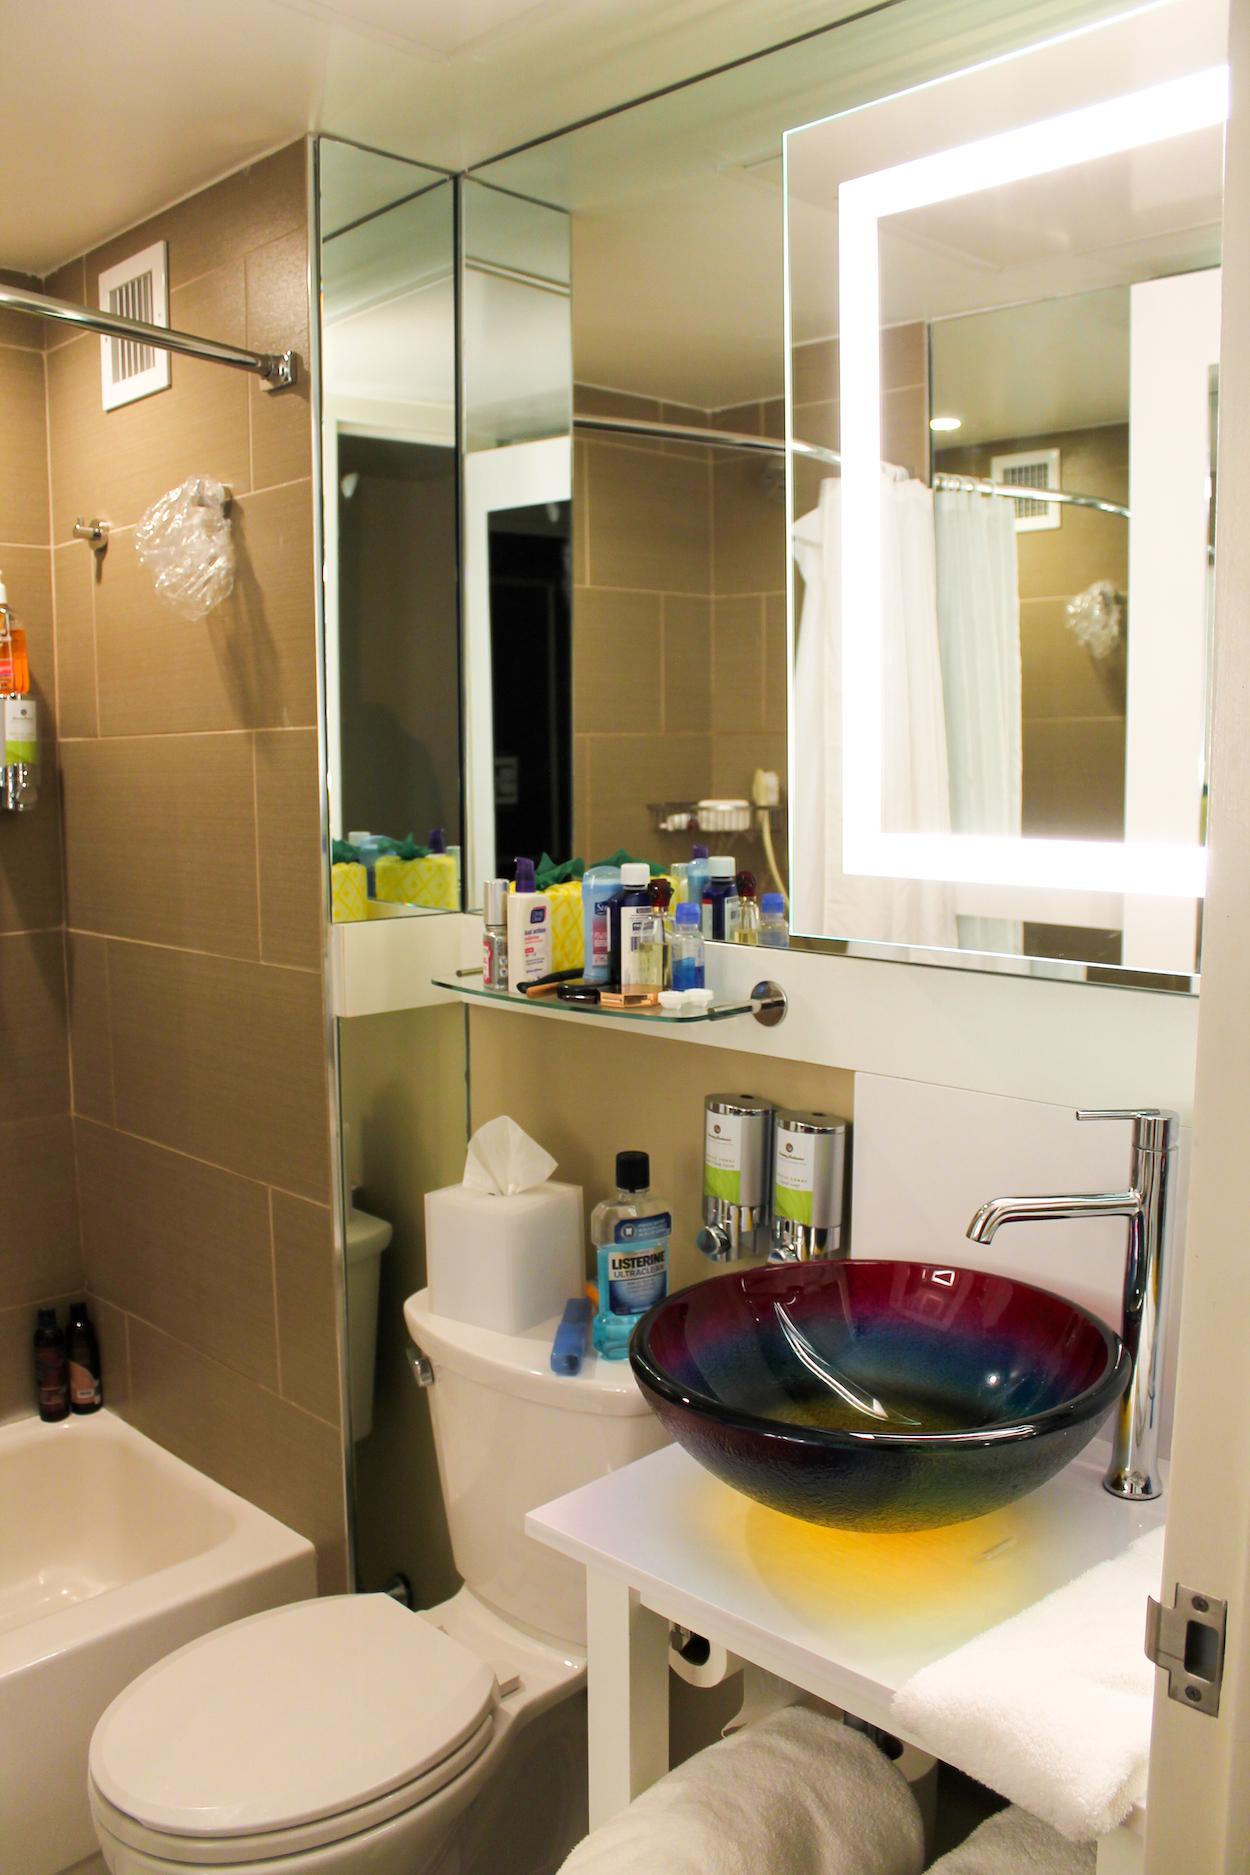 Inside the bathroom at StayPineapple Hotel New York